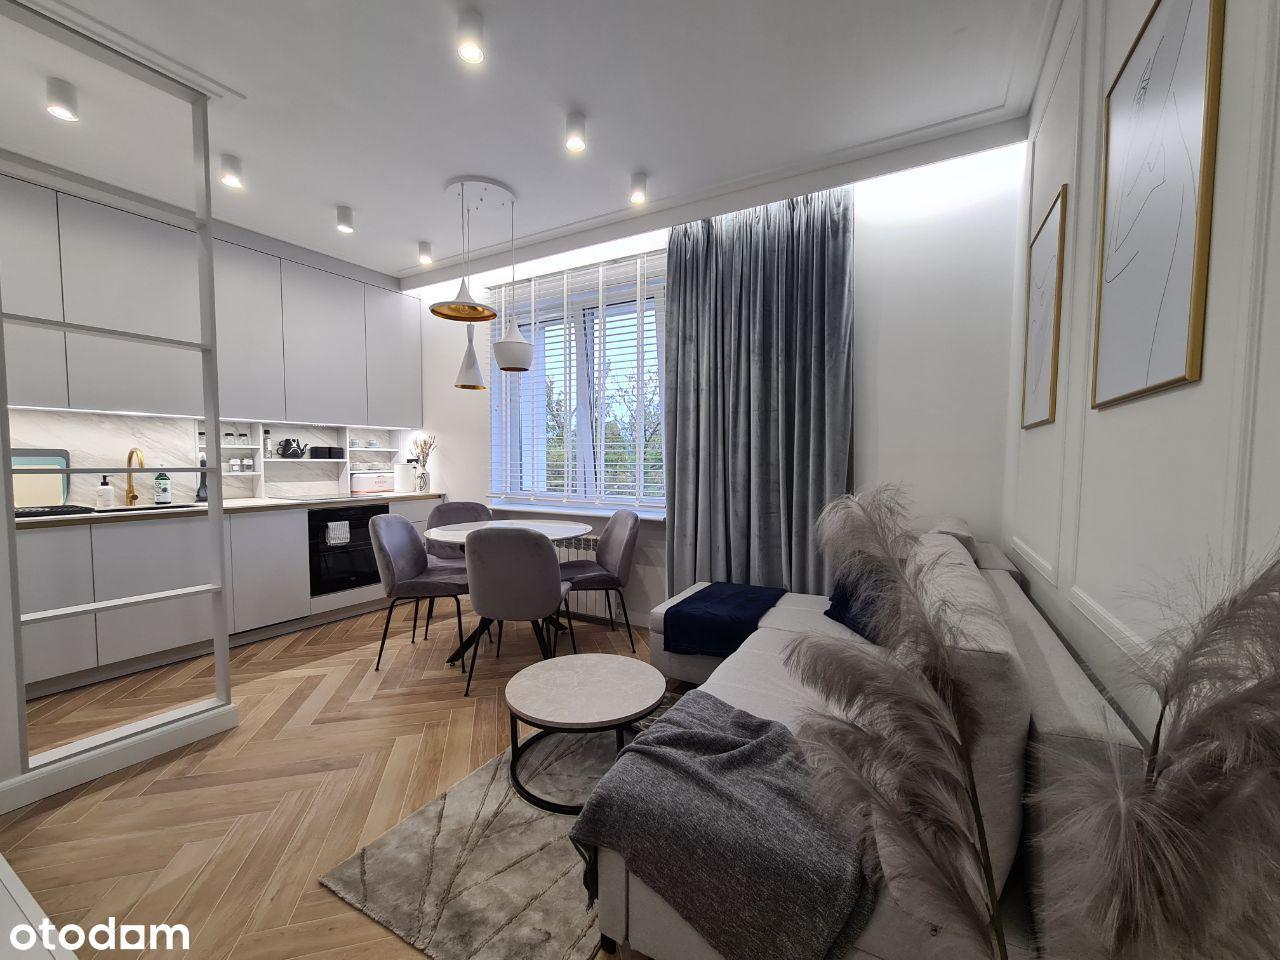 Komfortowe mieszkanie 32 m2 po remoncie nowe meble